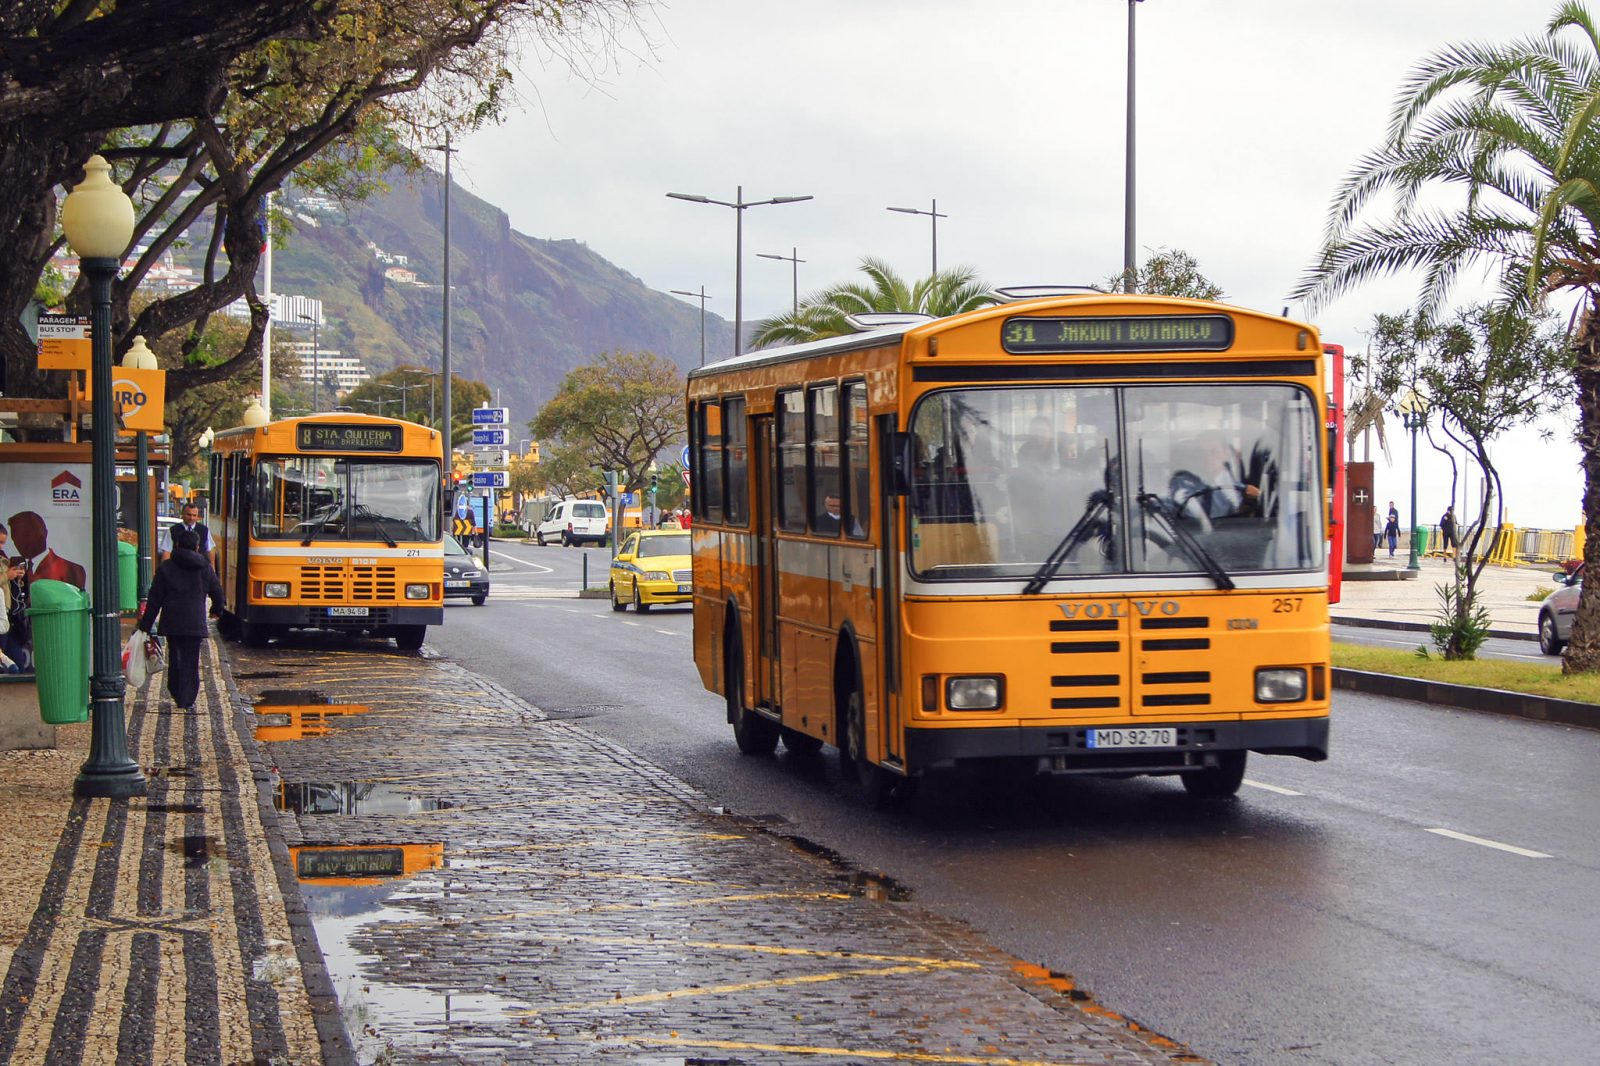 Автобус до Jardim Botânico (фото: kfinlay)